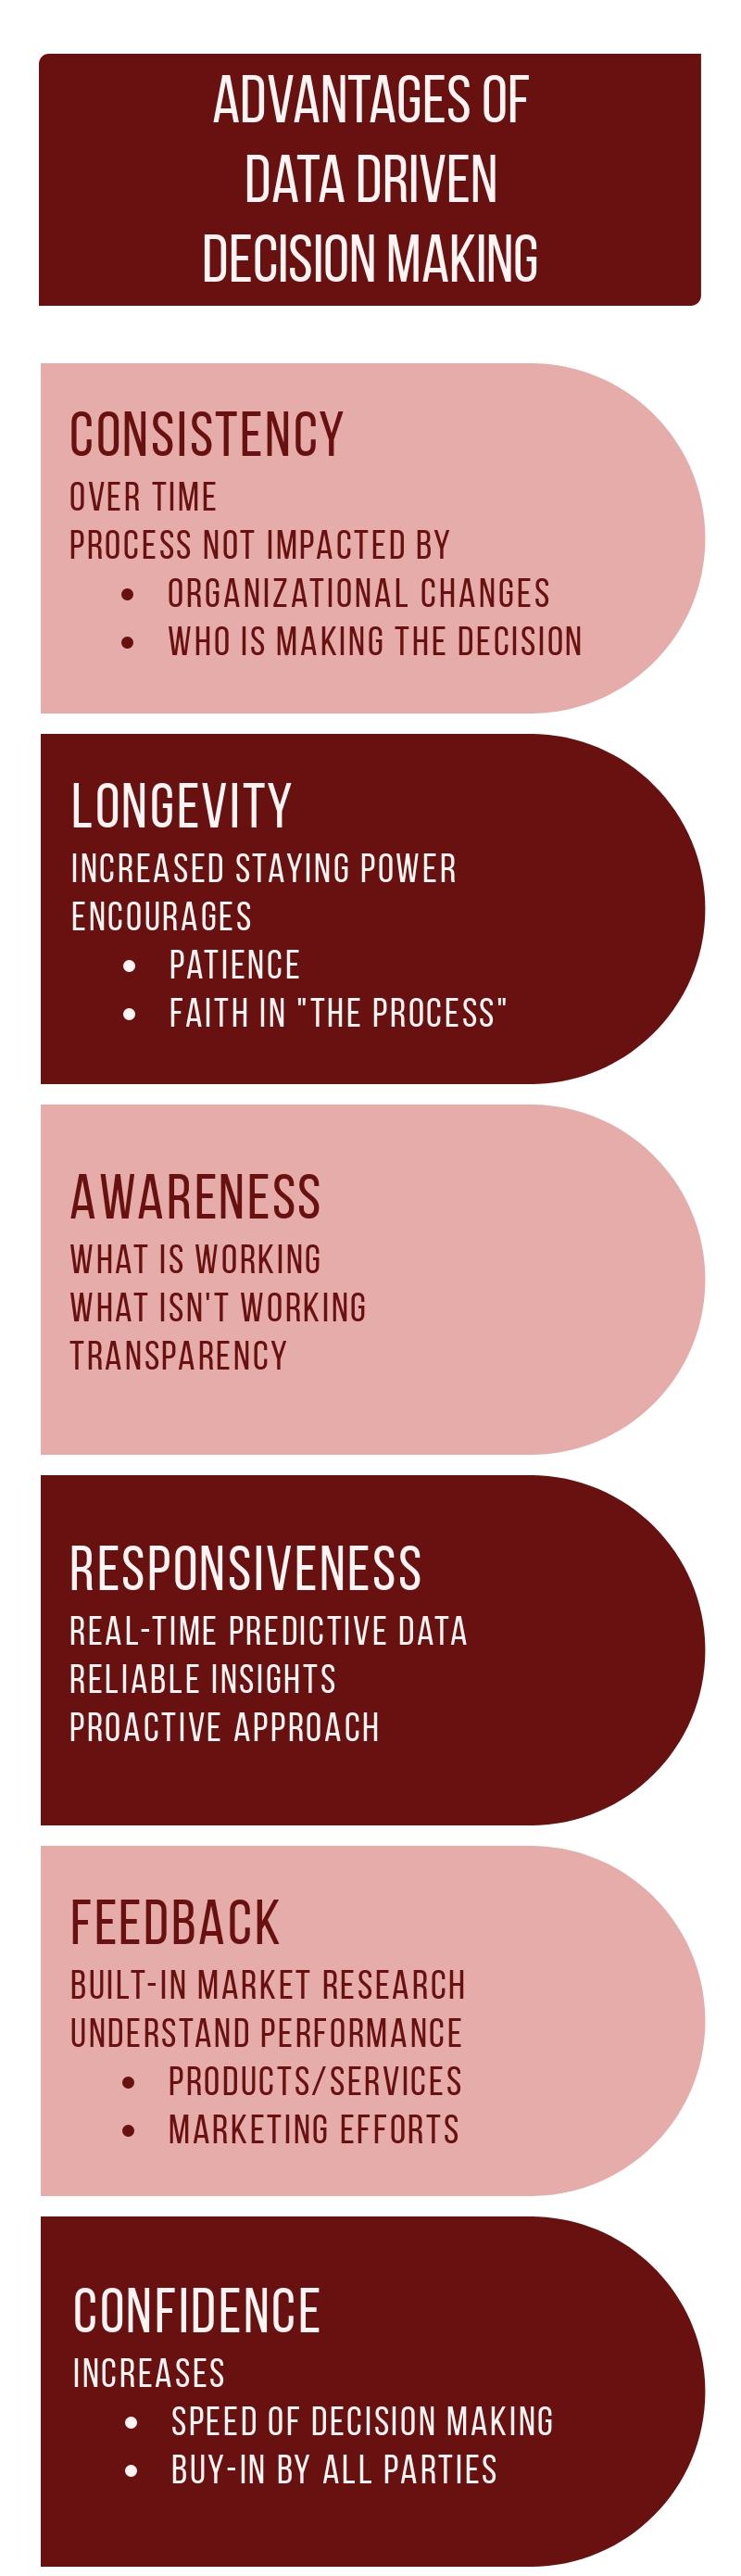 Infographic describing six organizational advantages of using a data driven decision making process